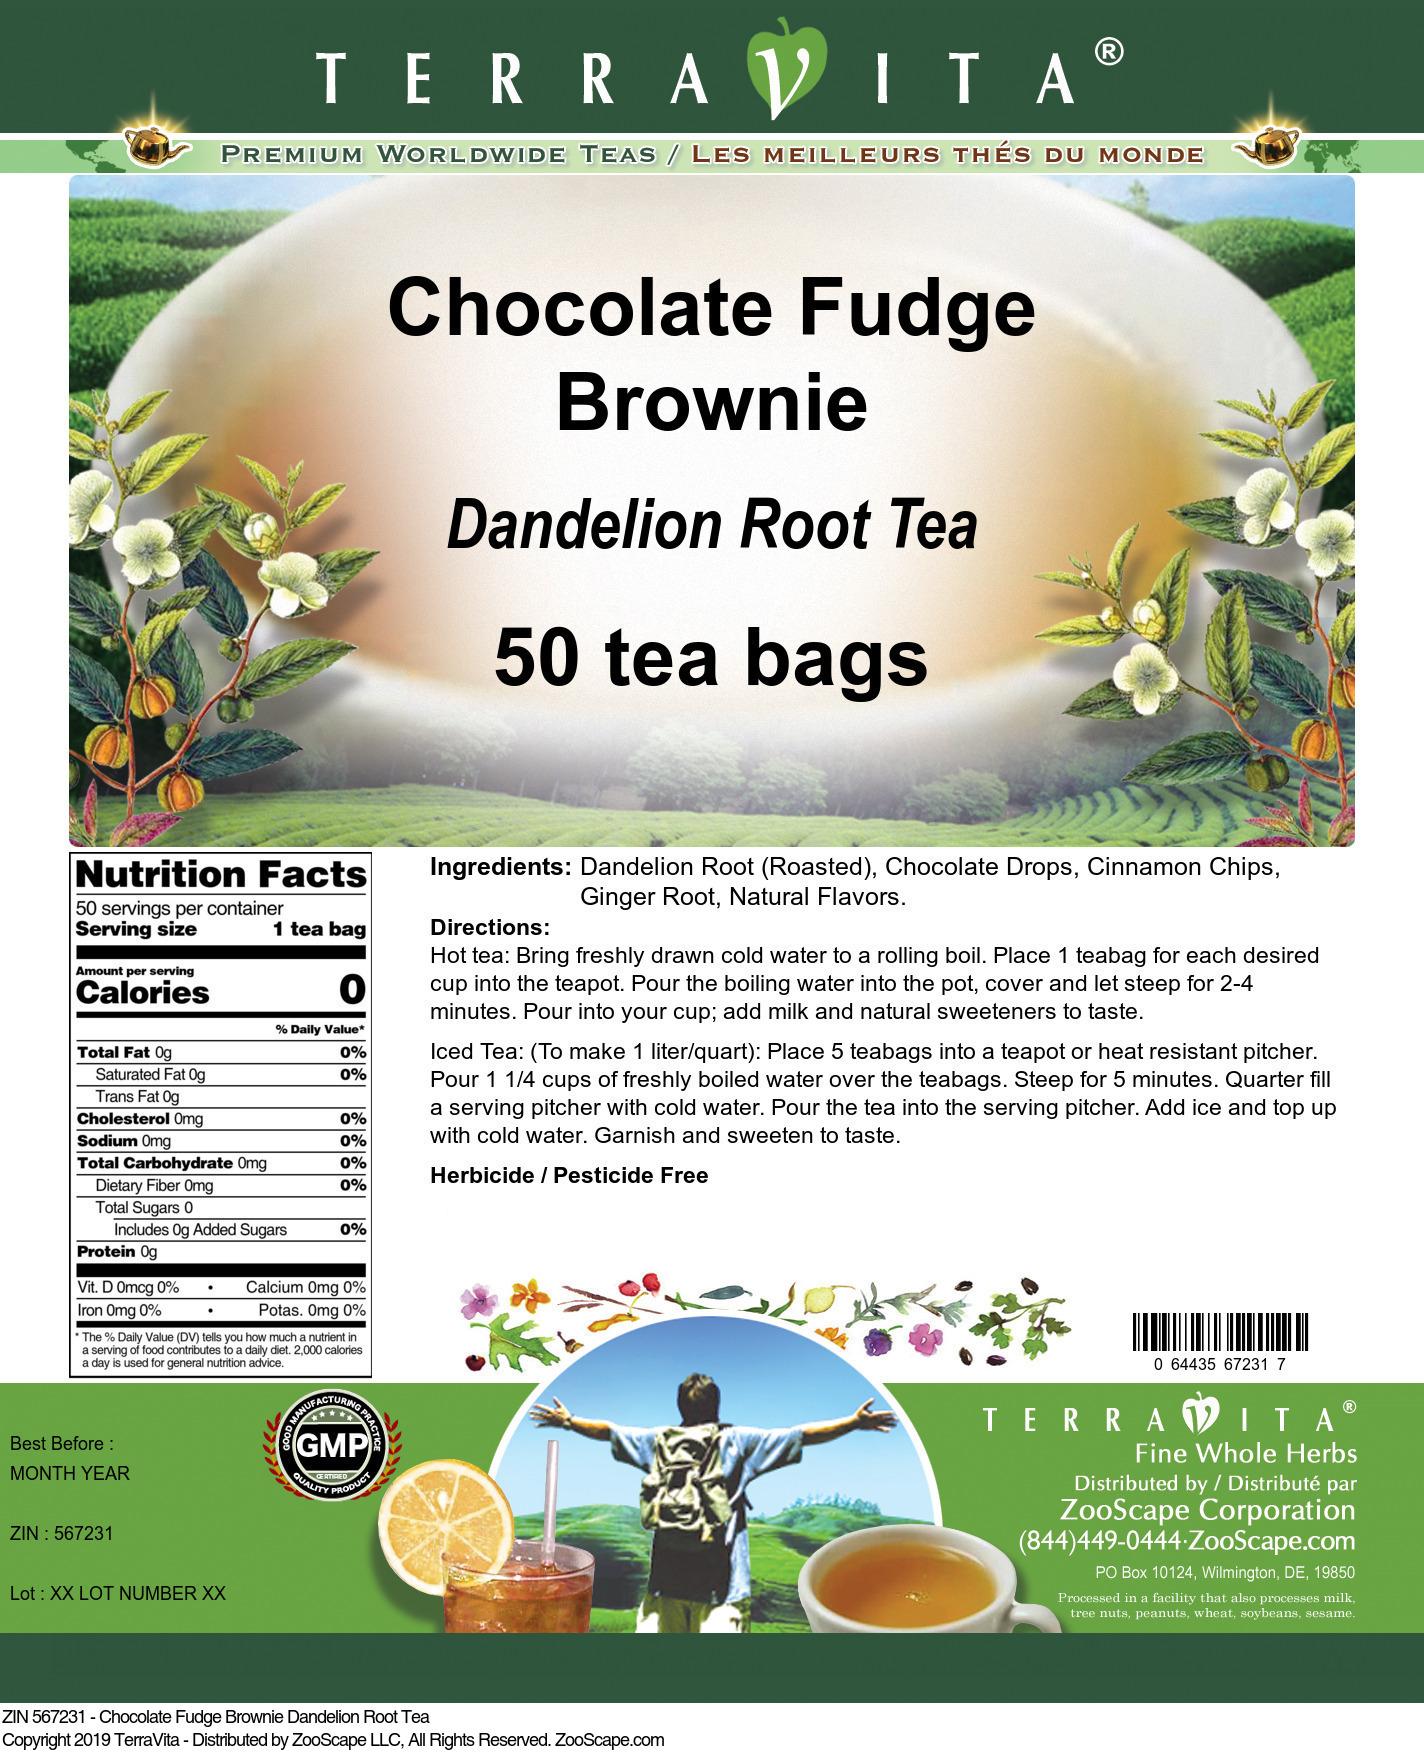 Chocolate Fudge Brownie Dandelion Root Tea